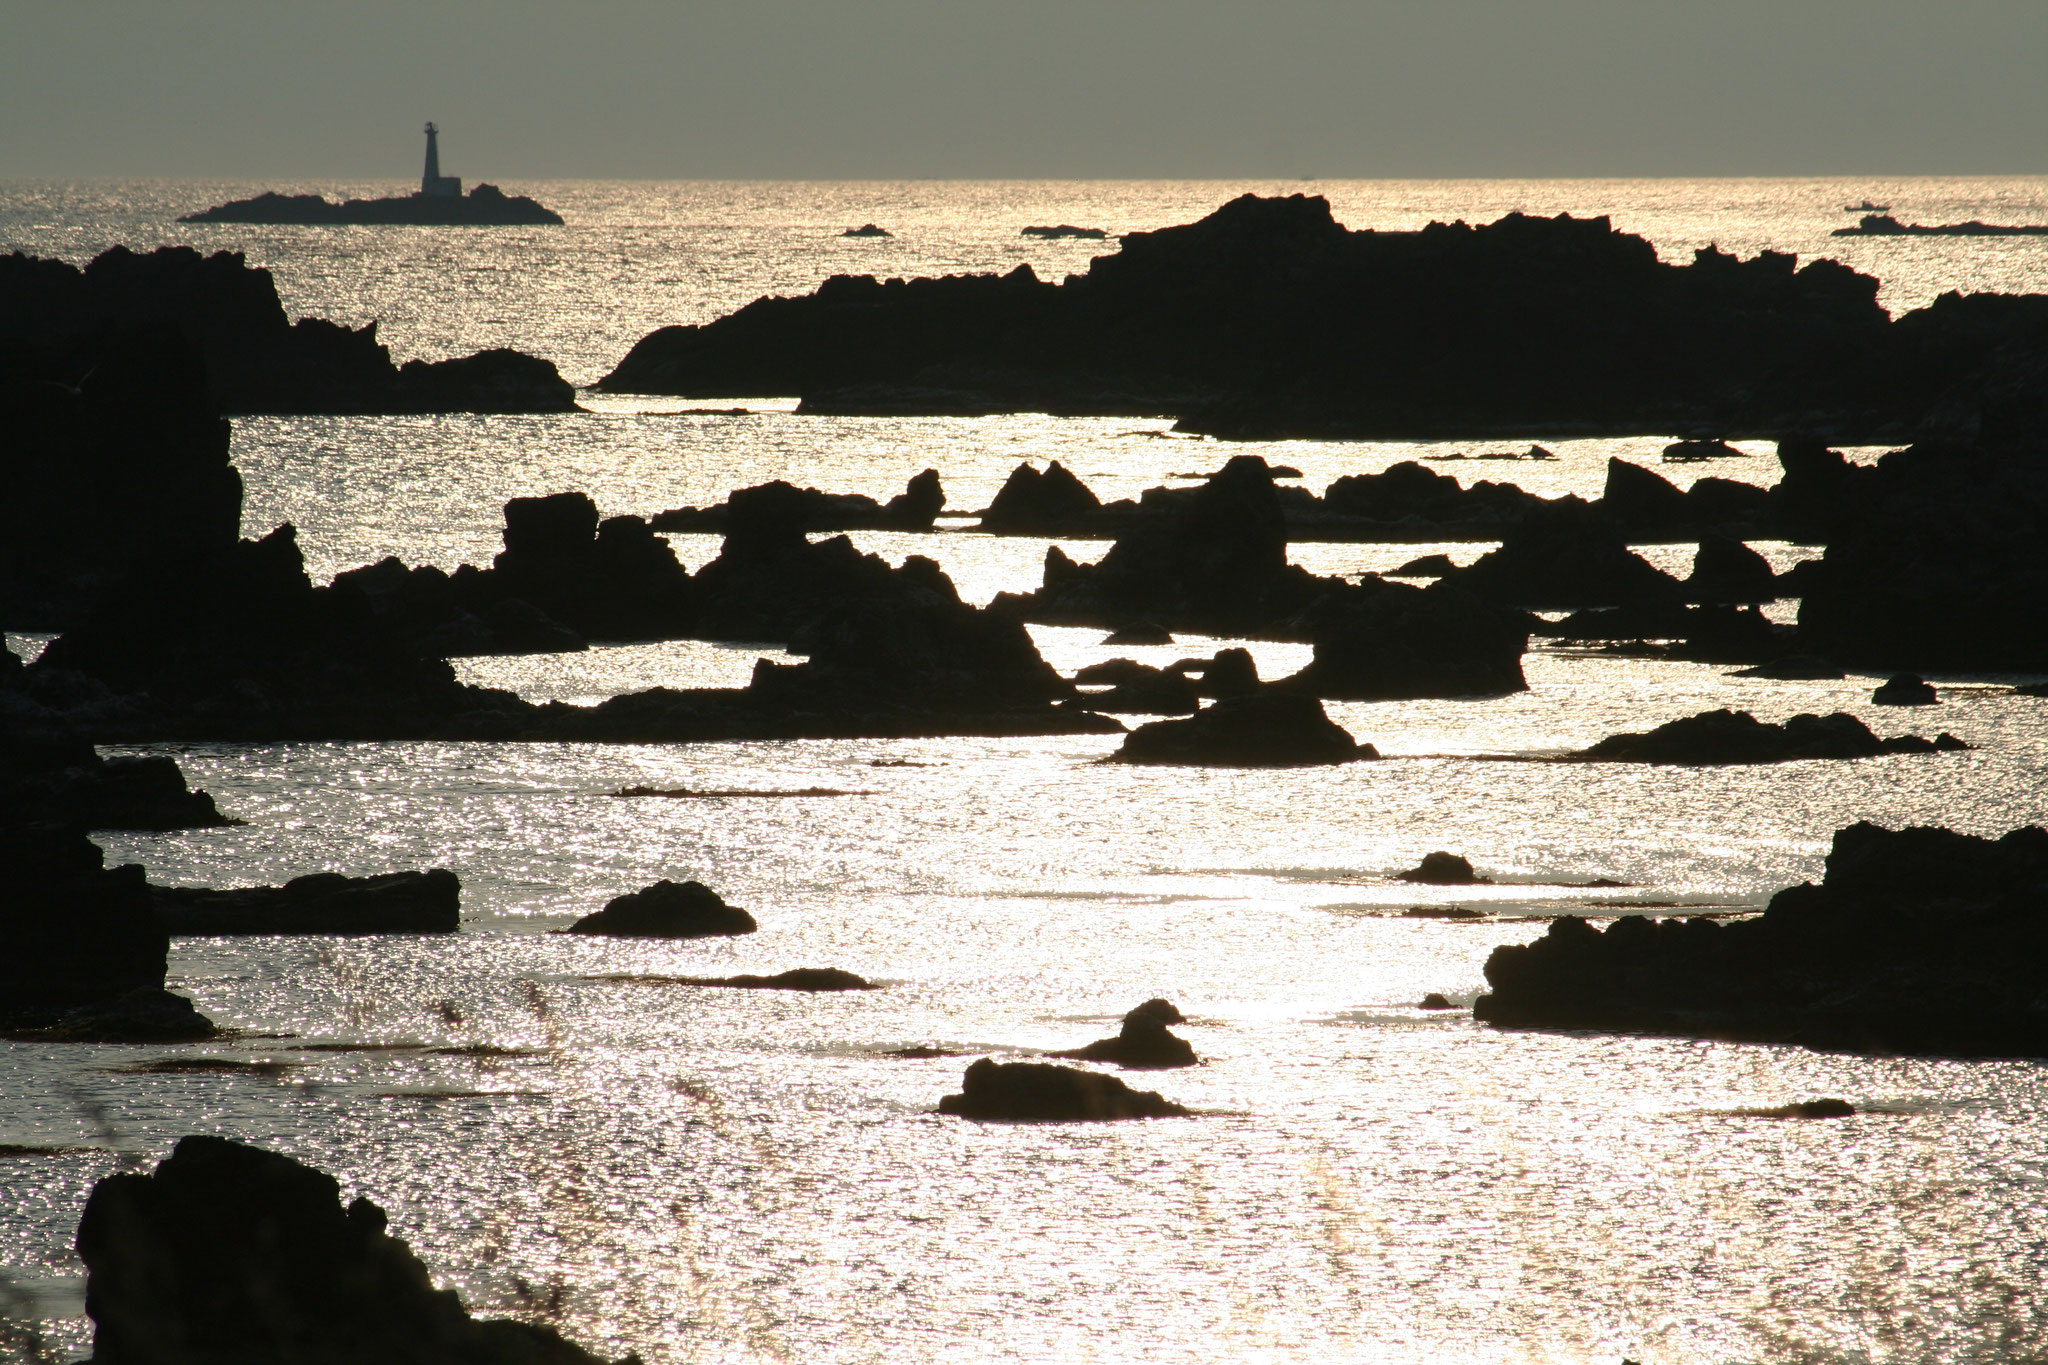 松前町海岸 津軽海峡波静か